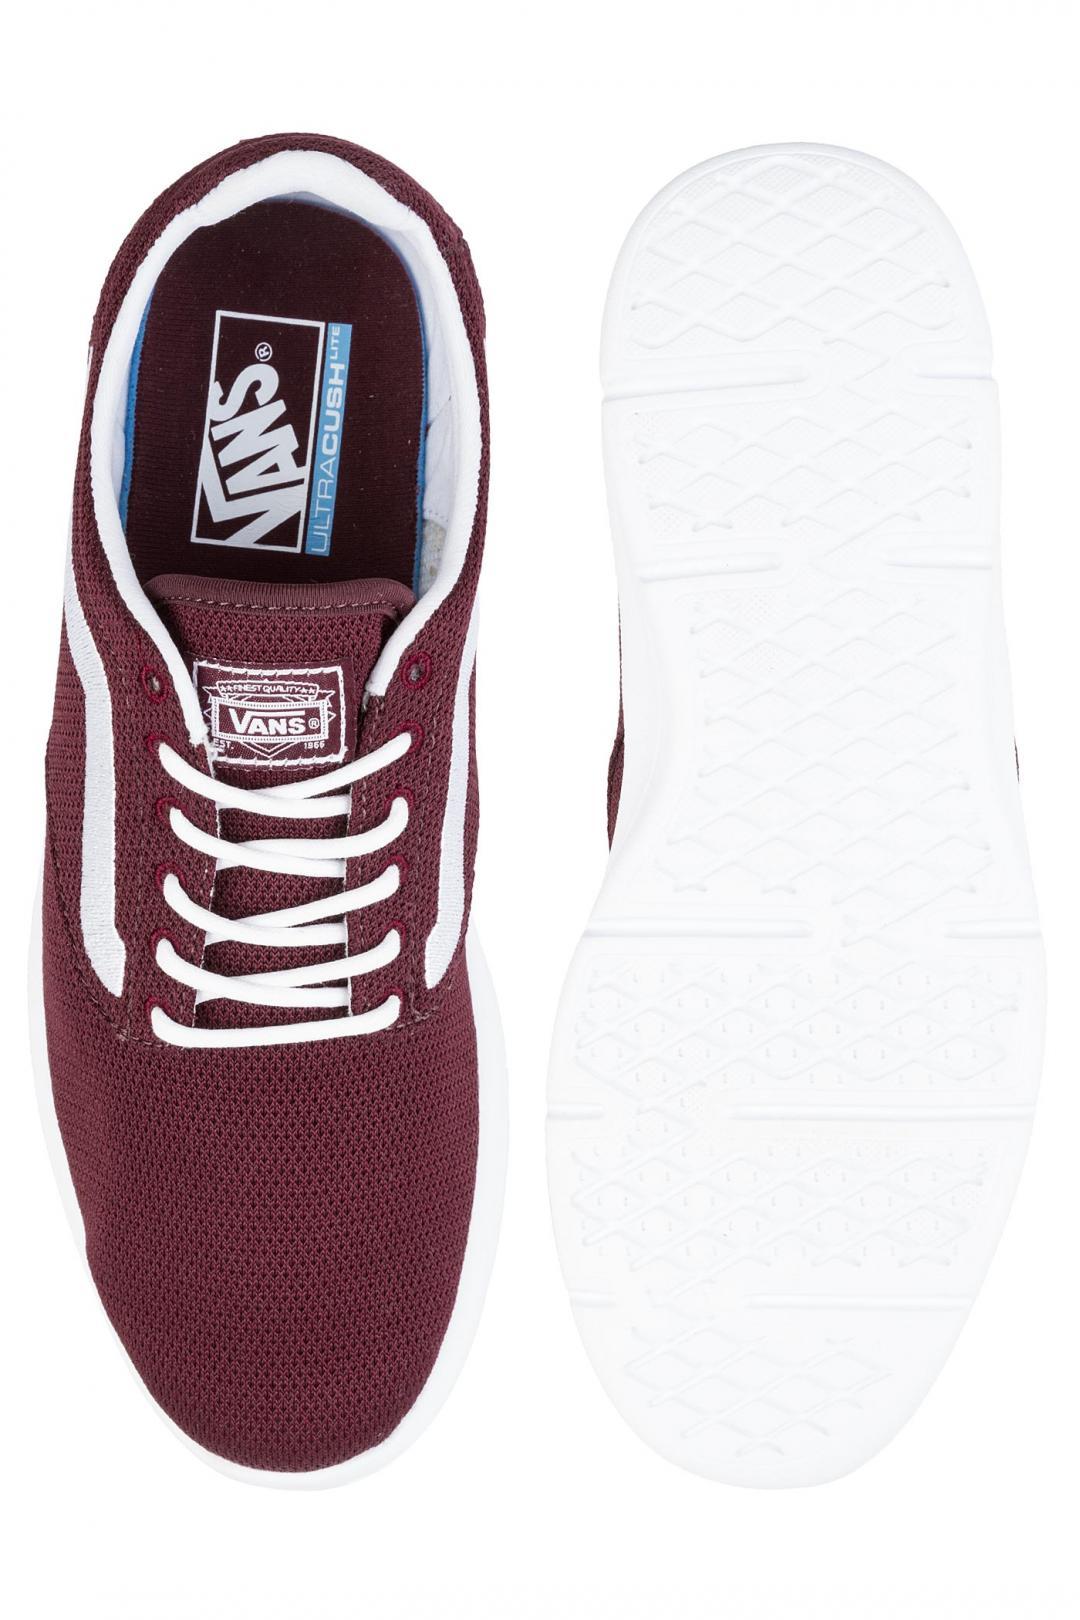 Uomo Vans Iso 1.5 Mesh port royale | Sneaker